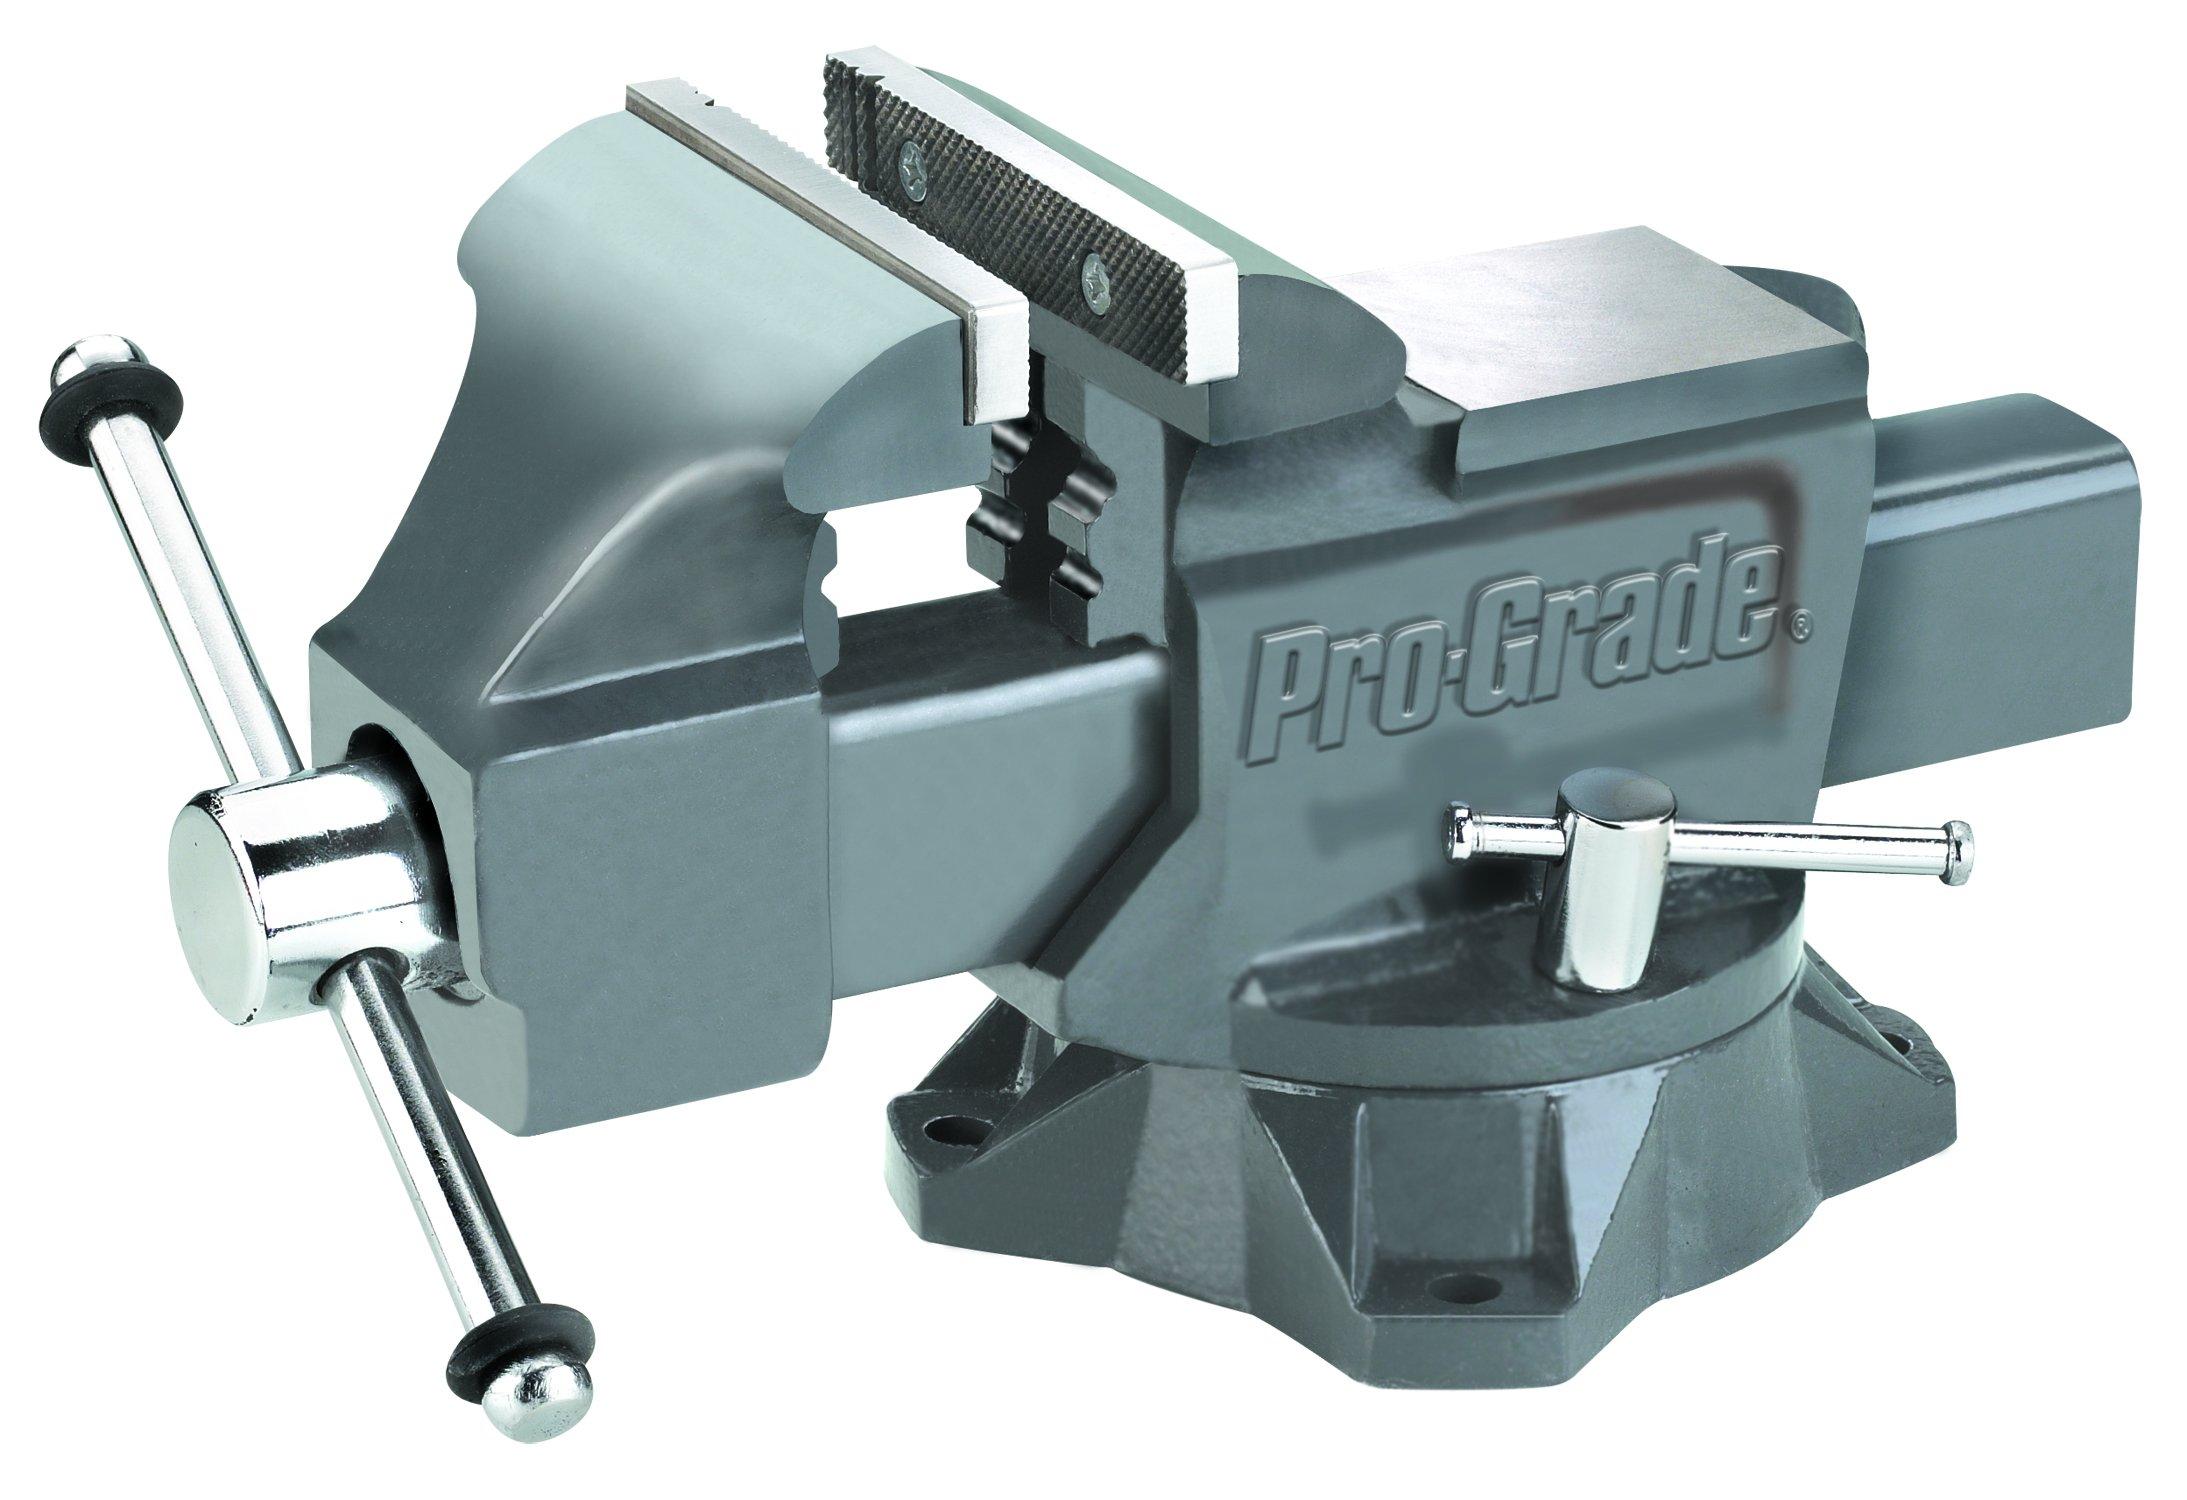 Pro-Grade 59115 Heavy Duty Swivel Bench Vice, 6-Inch